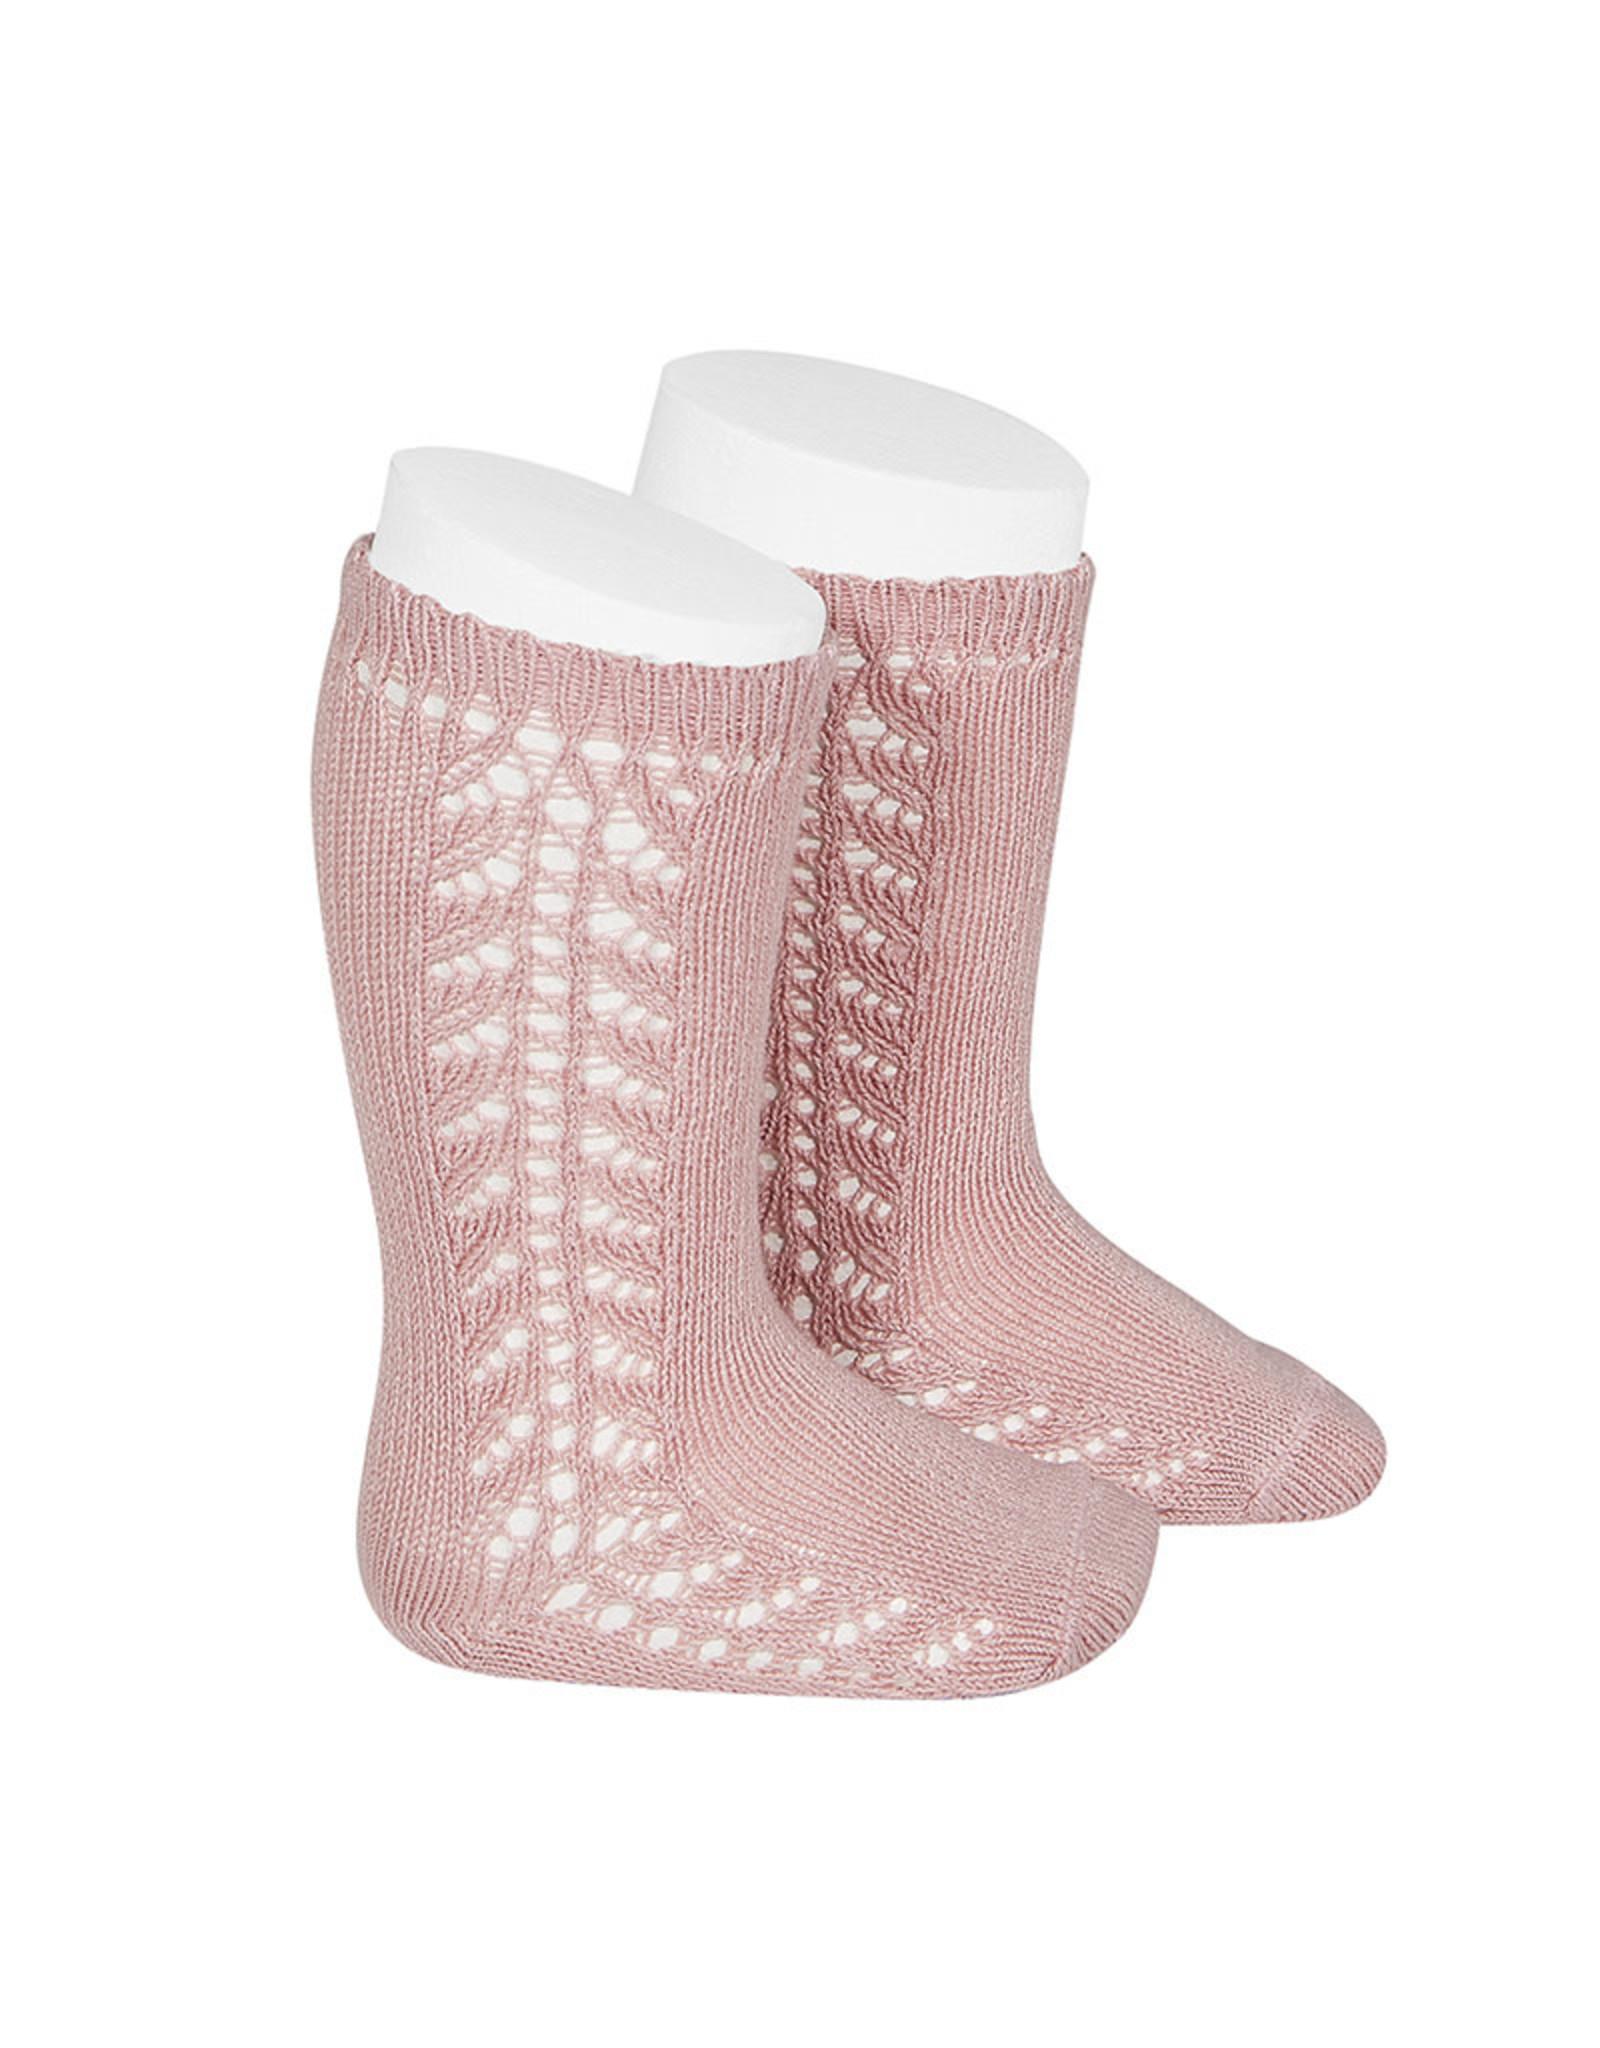 CONDOR Pale Pink Warm Side Openwork Socks